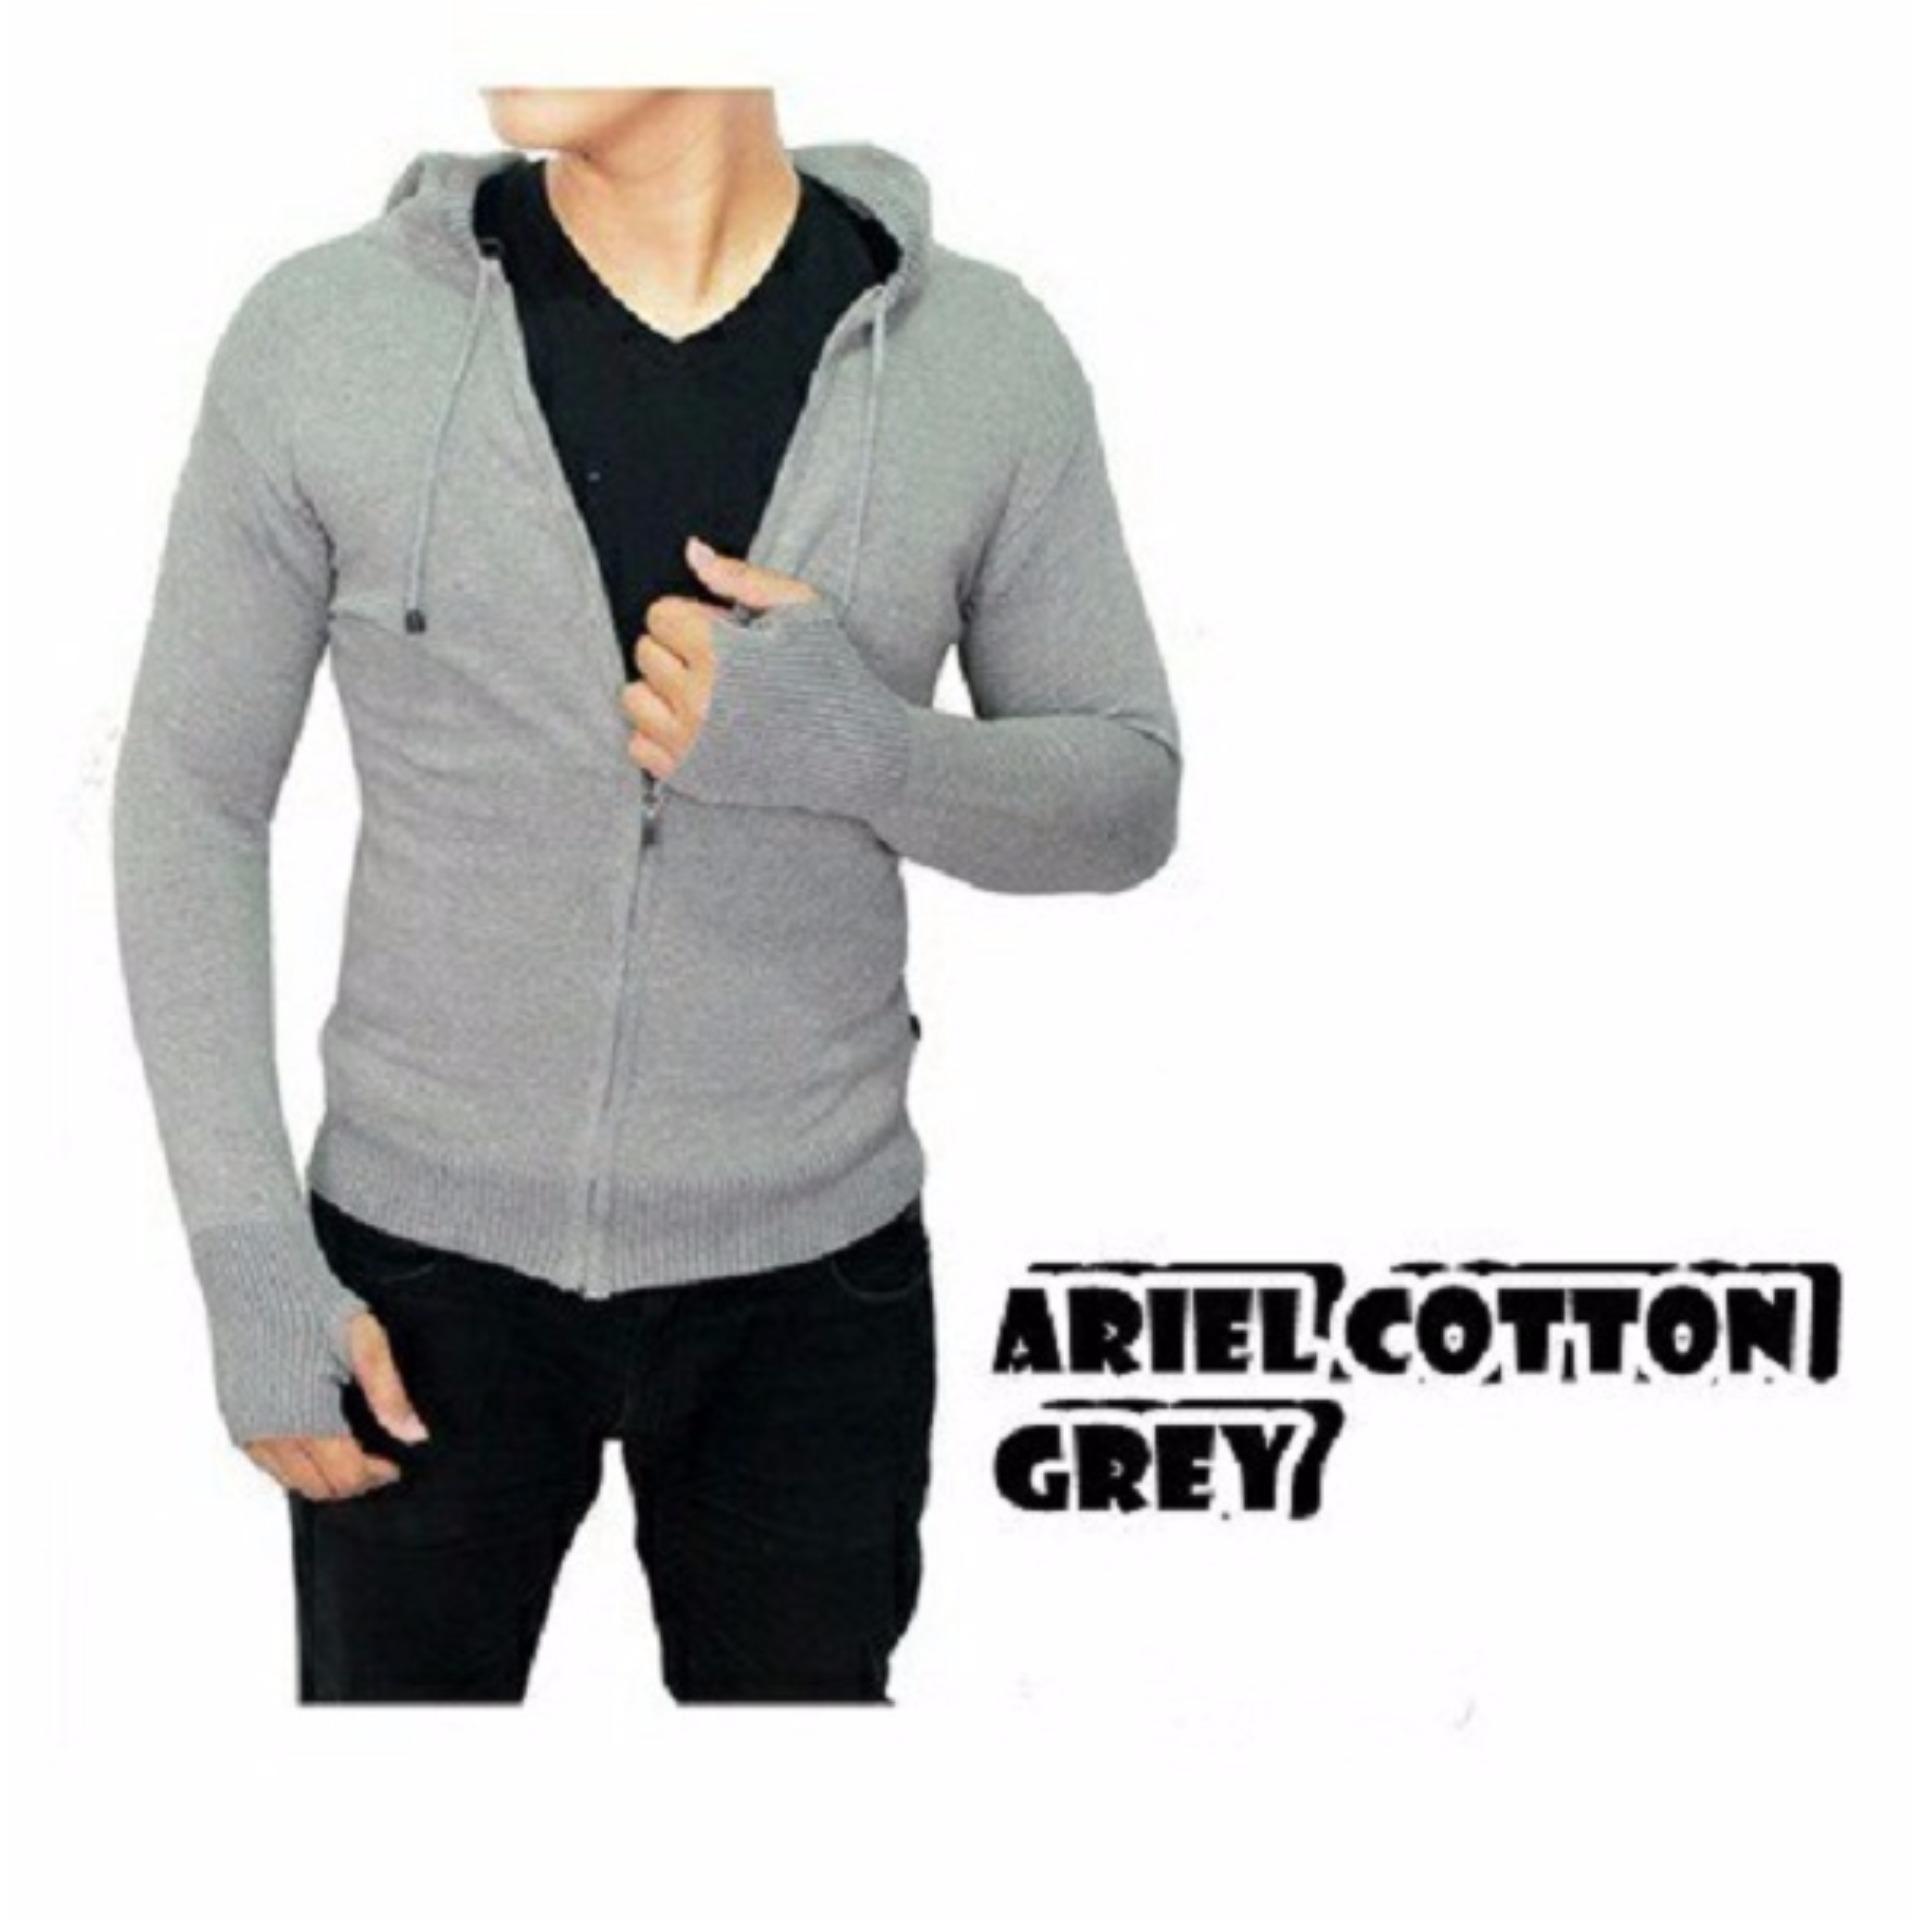 Produk Promo Jaket Wp Biru Polos All Club Bola Keren Bagus Pria Anti Zipper Hoodie Sweater Tudung Model Ariel Premium